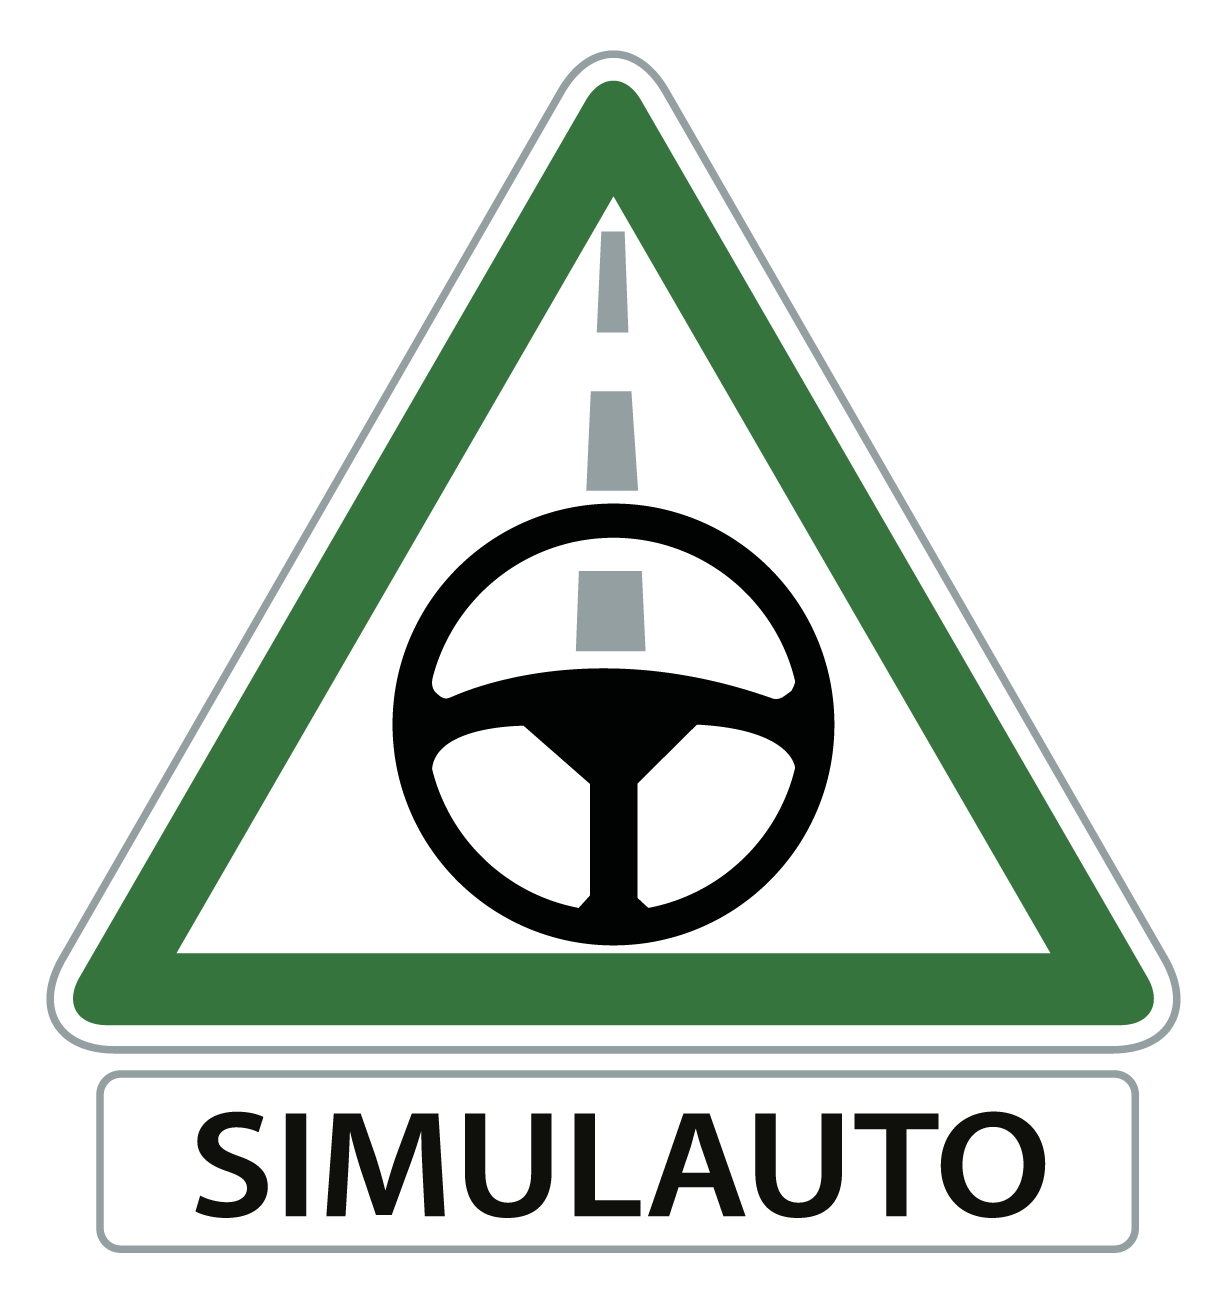 Logo Simulauto